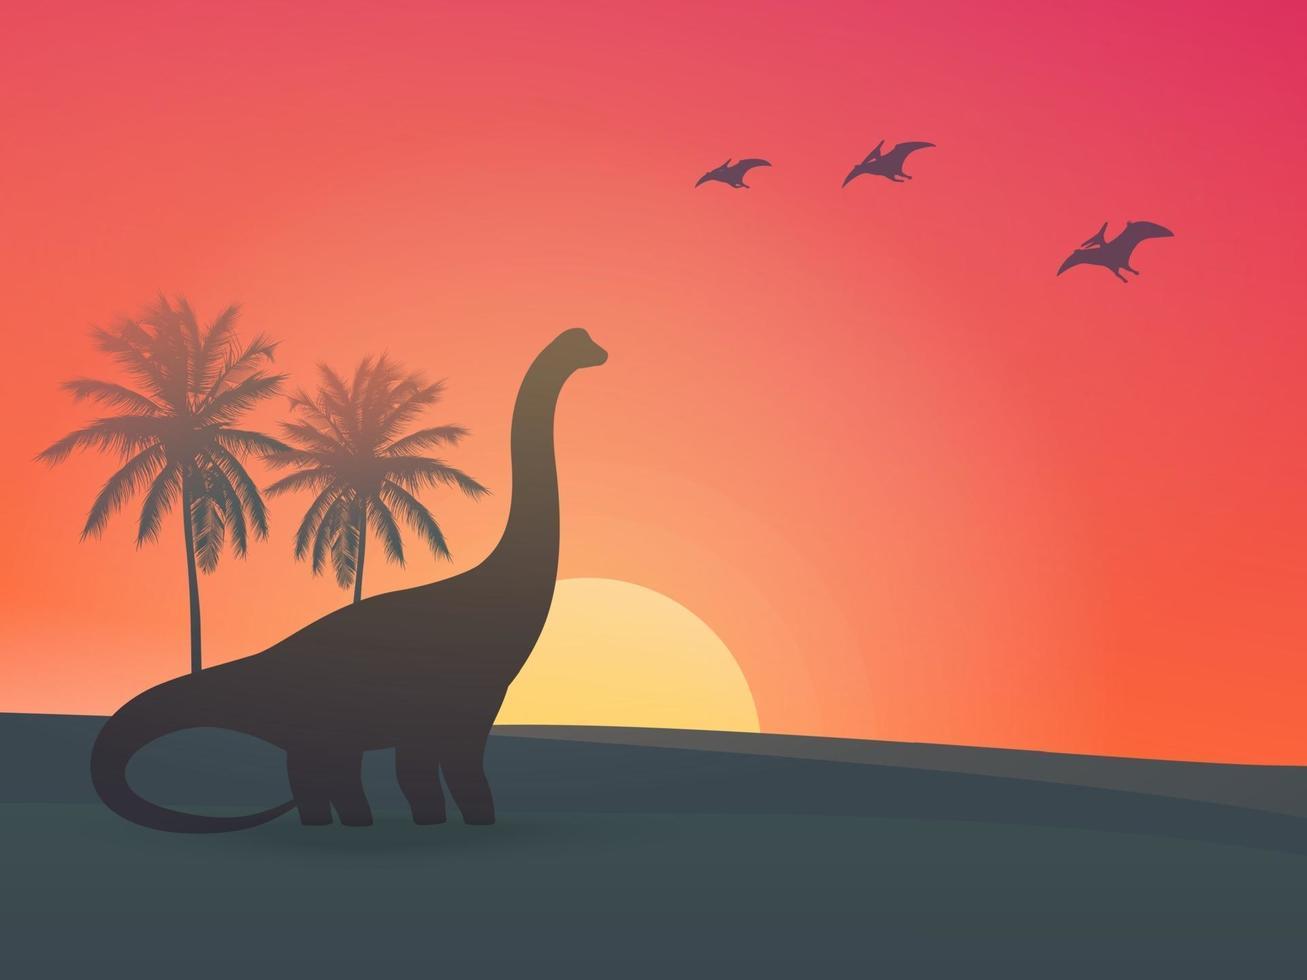 dinosaurus, sauropod bij zonsondergang vector illustration.eps